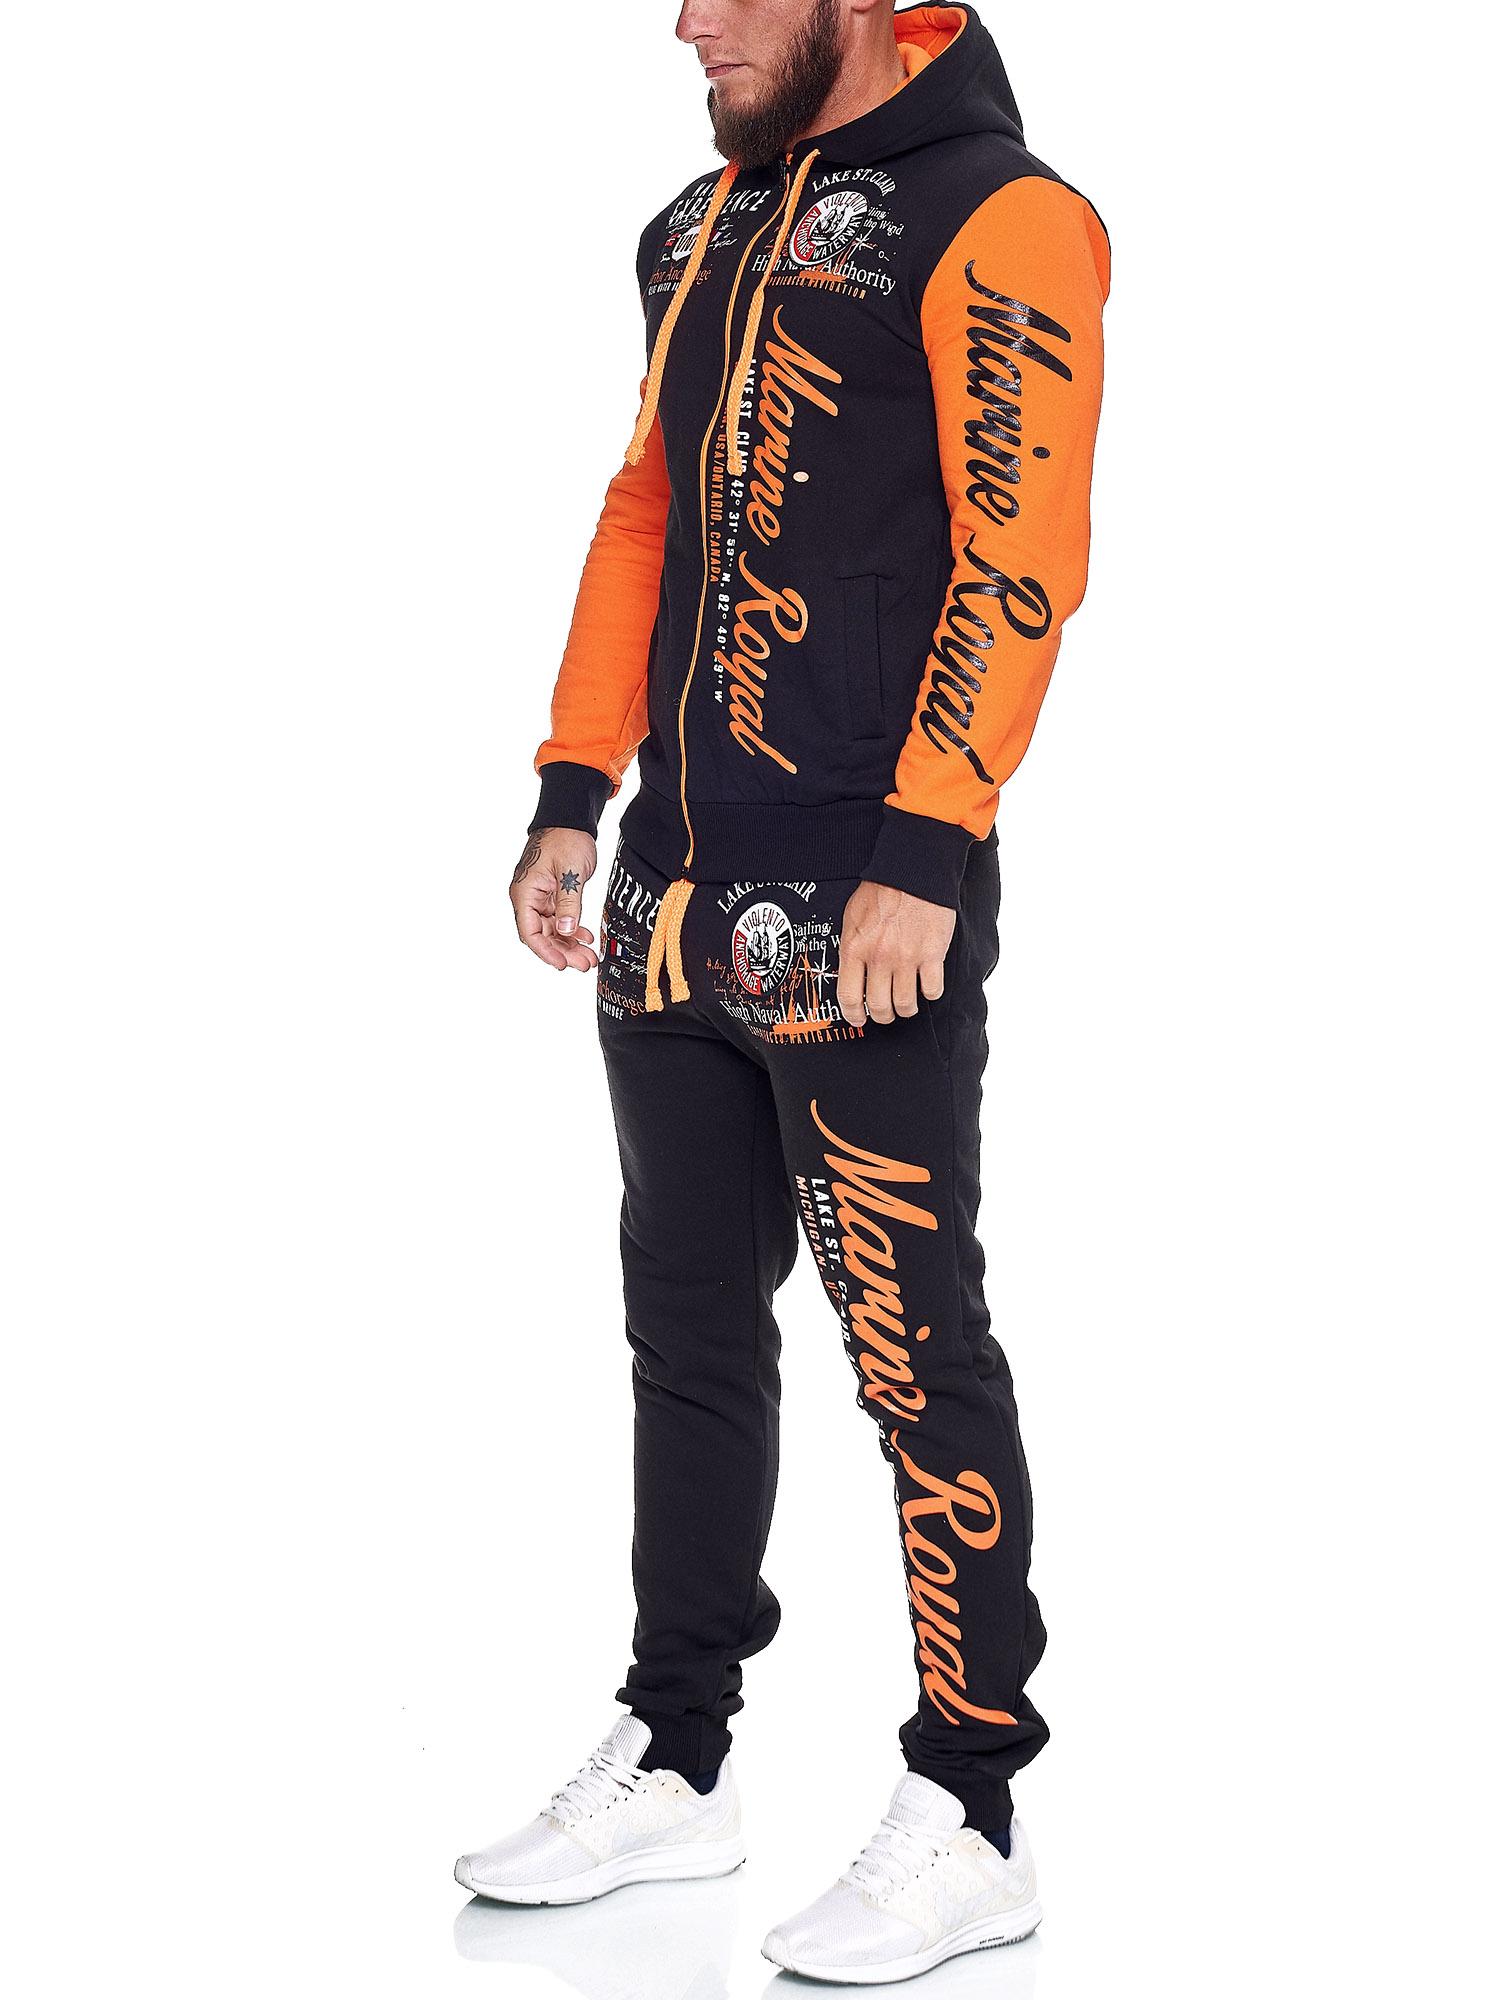 Damen-Jogginganzug-Frauen-Trainingsanzug-Sportanzug-Streetwear-JG-512-John-Kayna Indexbild 32